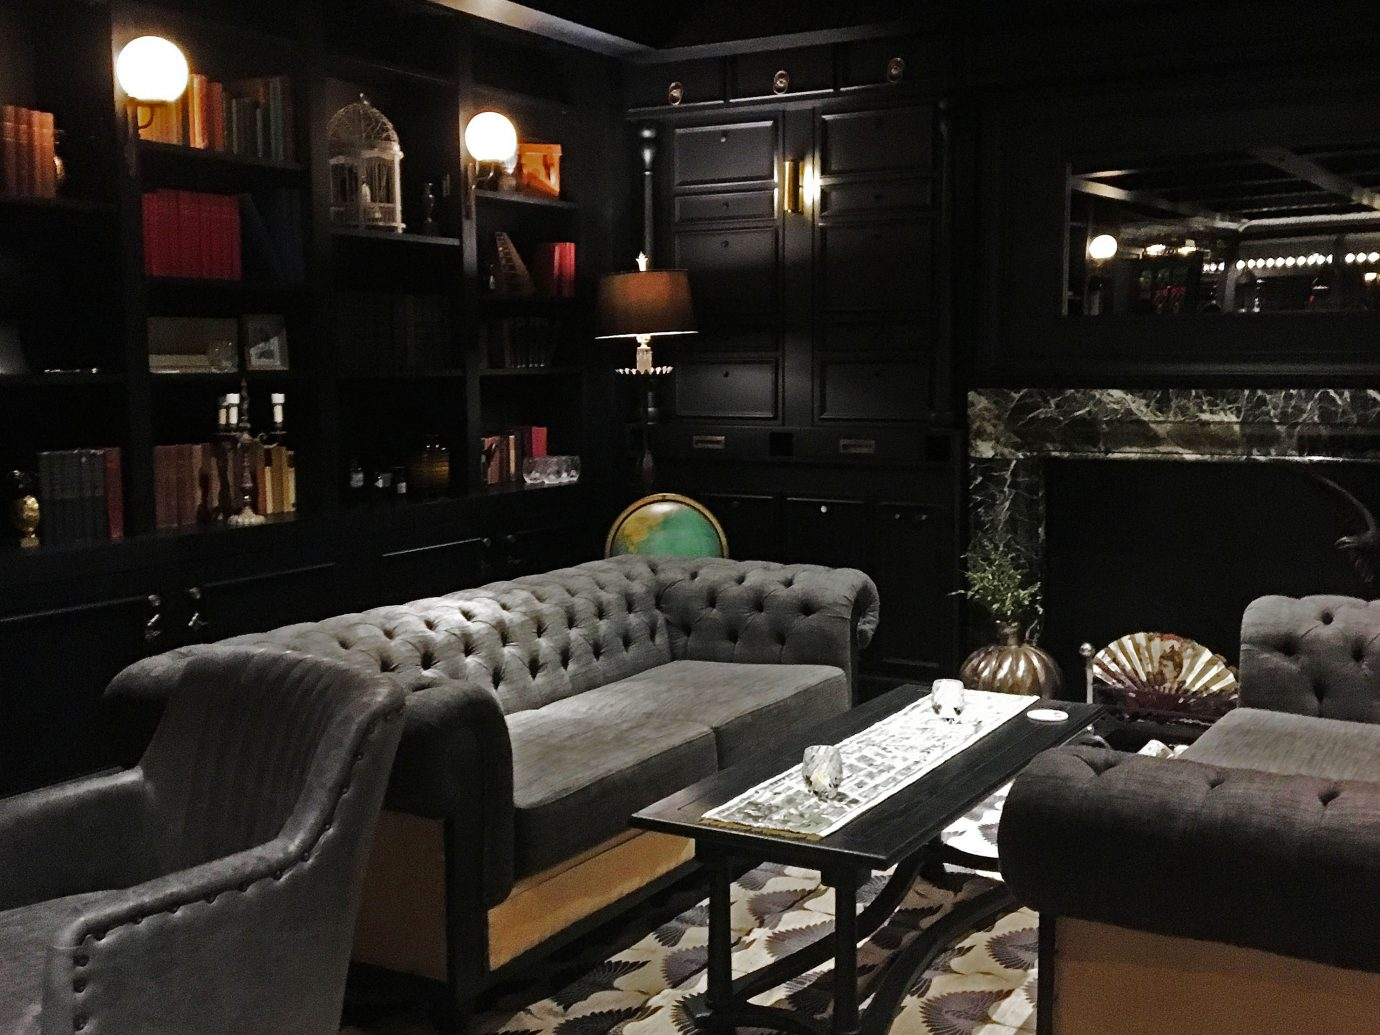 Hendricks Lounge in Scotland